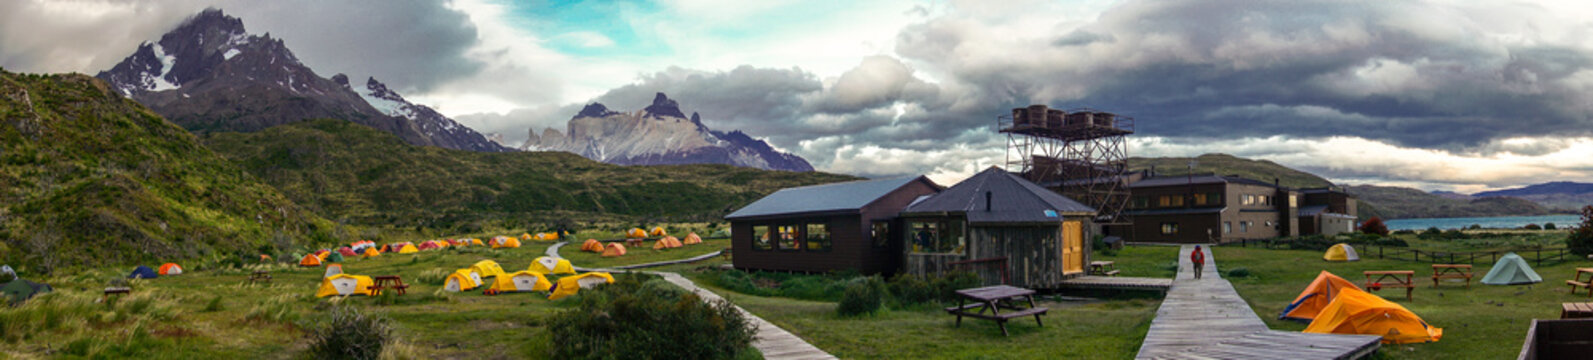 W-Circuit Torres Del Paine, Chile